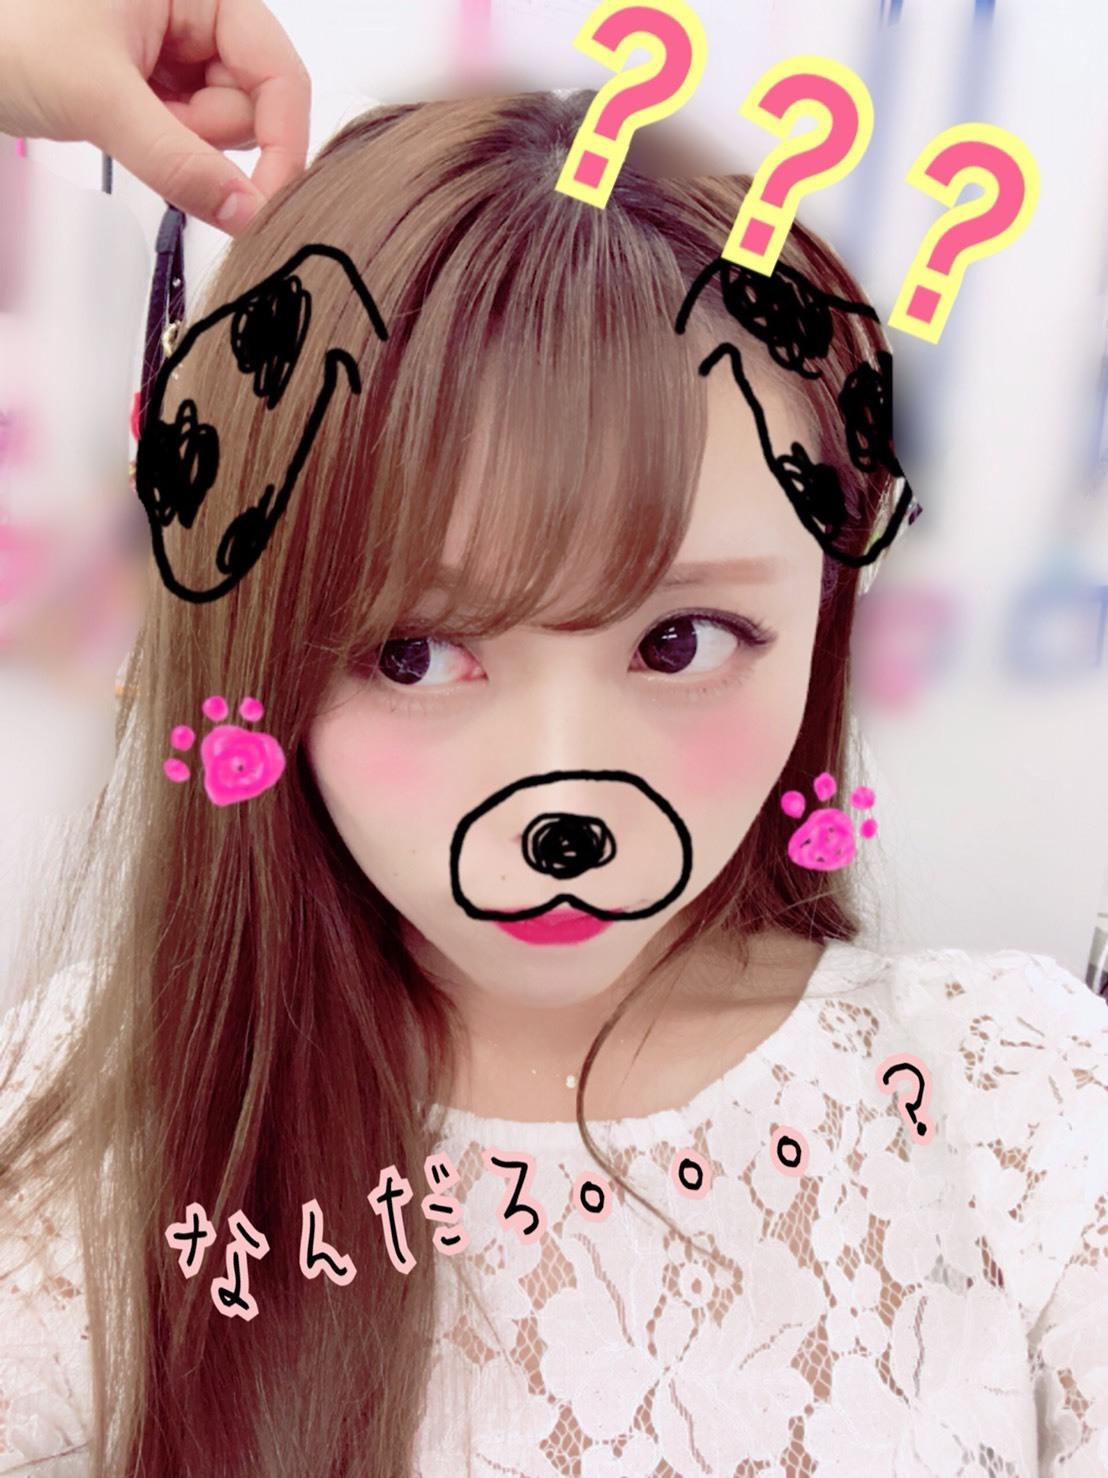 S__16547851.jpg